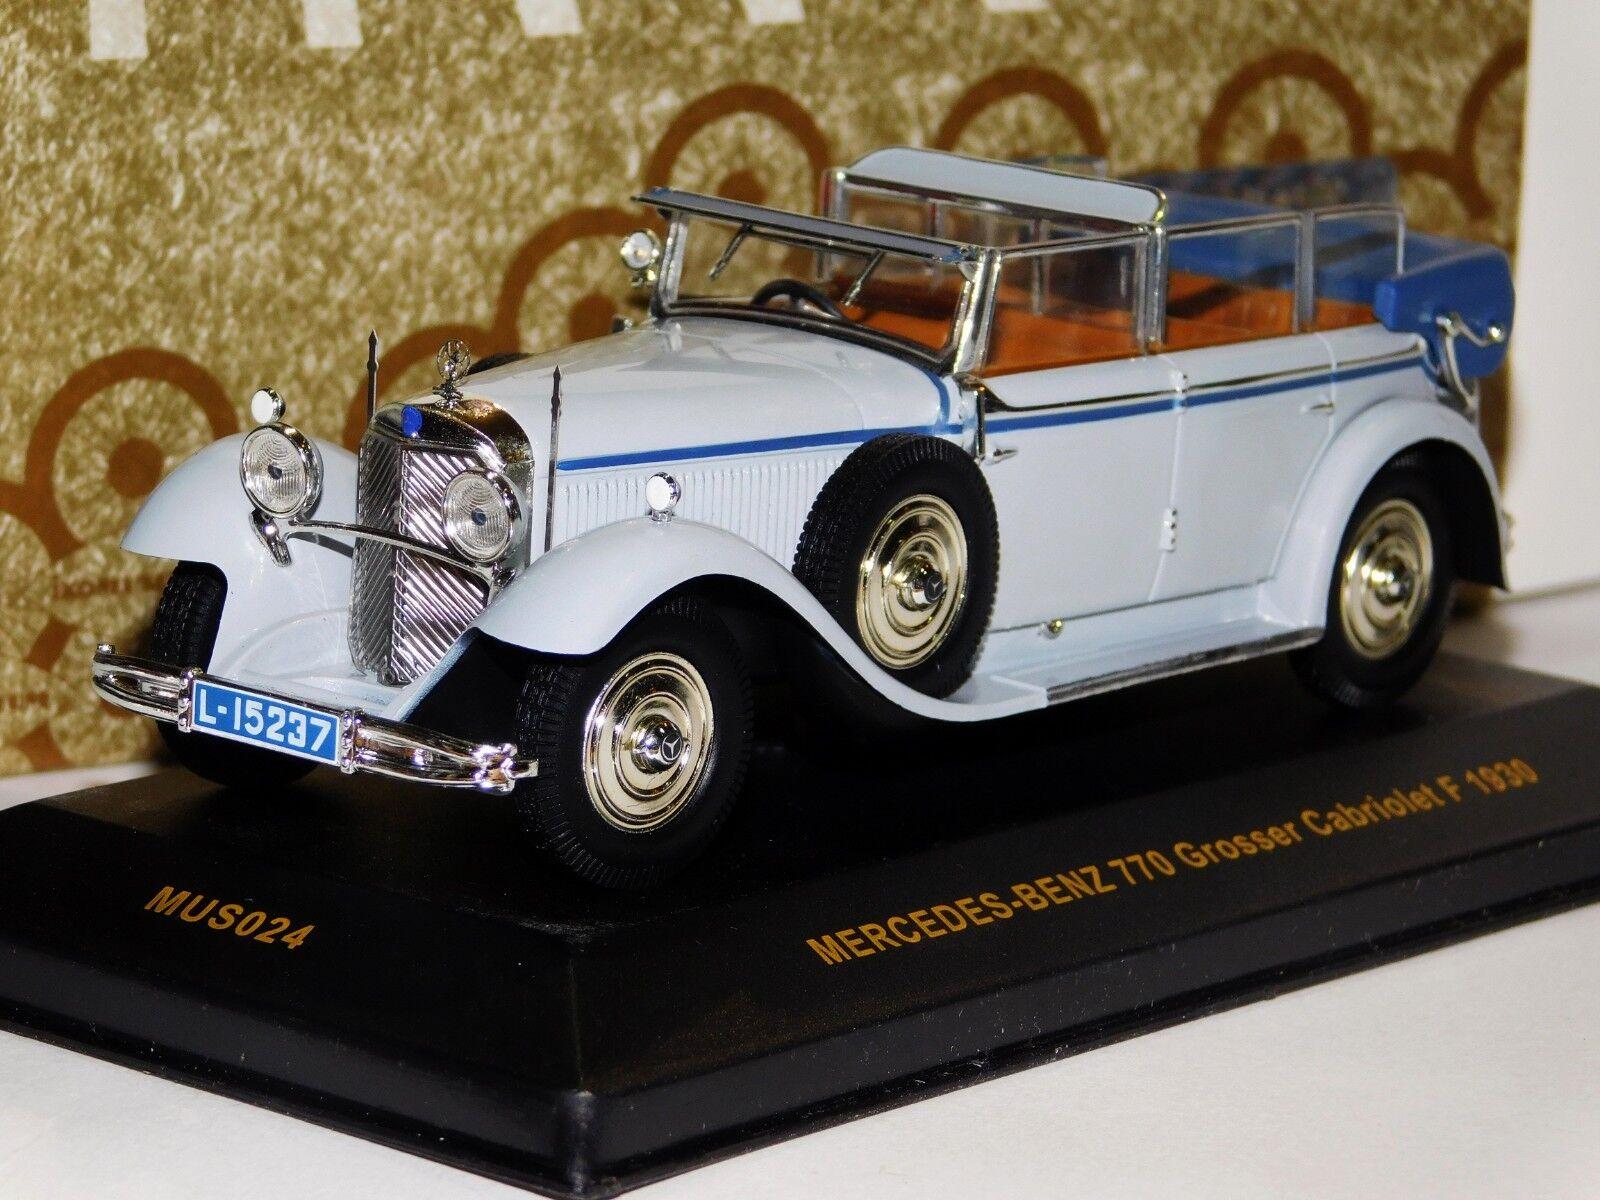 MERCEDES BENZ 770 GROSSER CABRIOLET F 1930 IXO MUSEUM MUS024 1 43